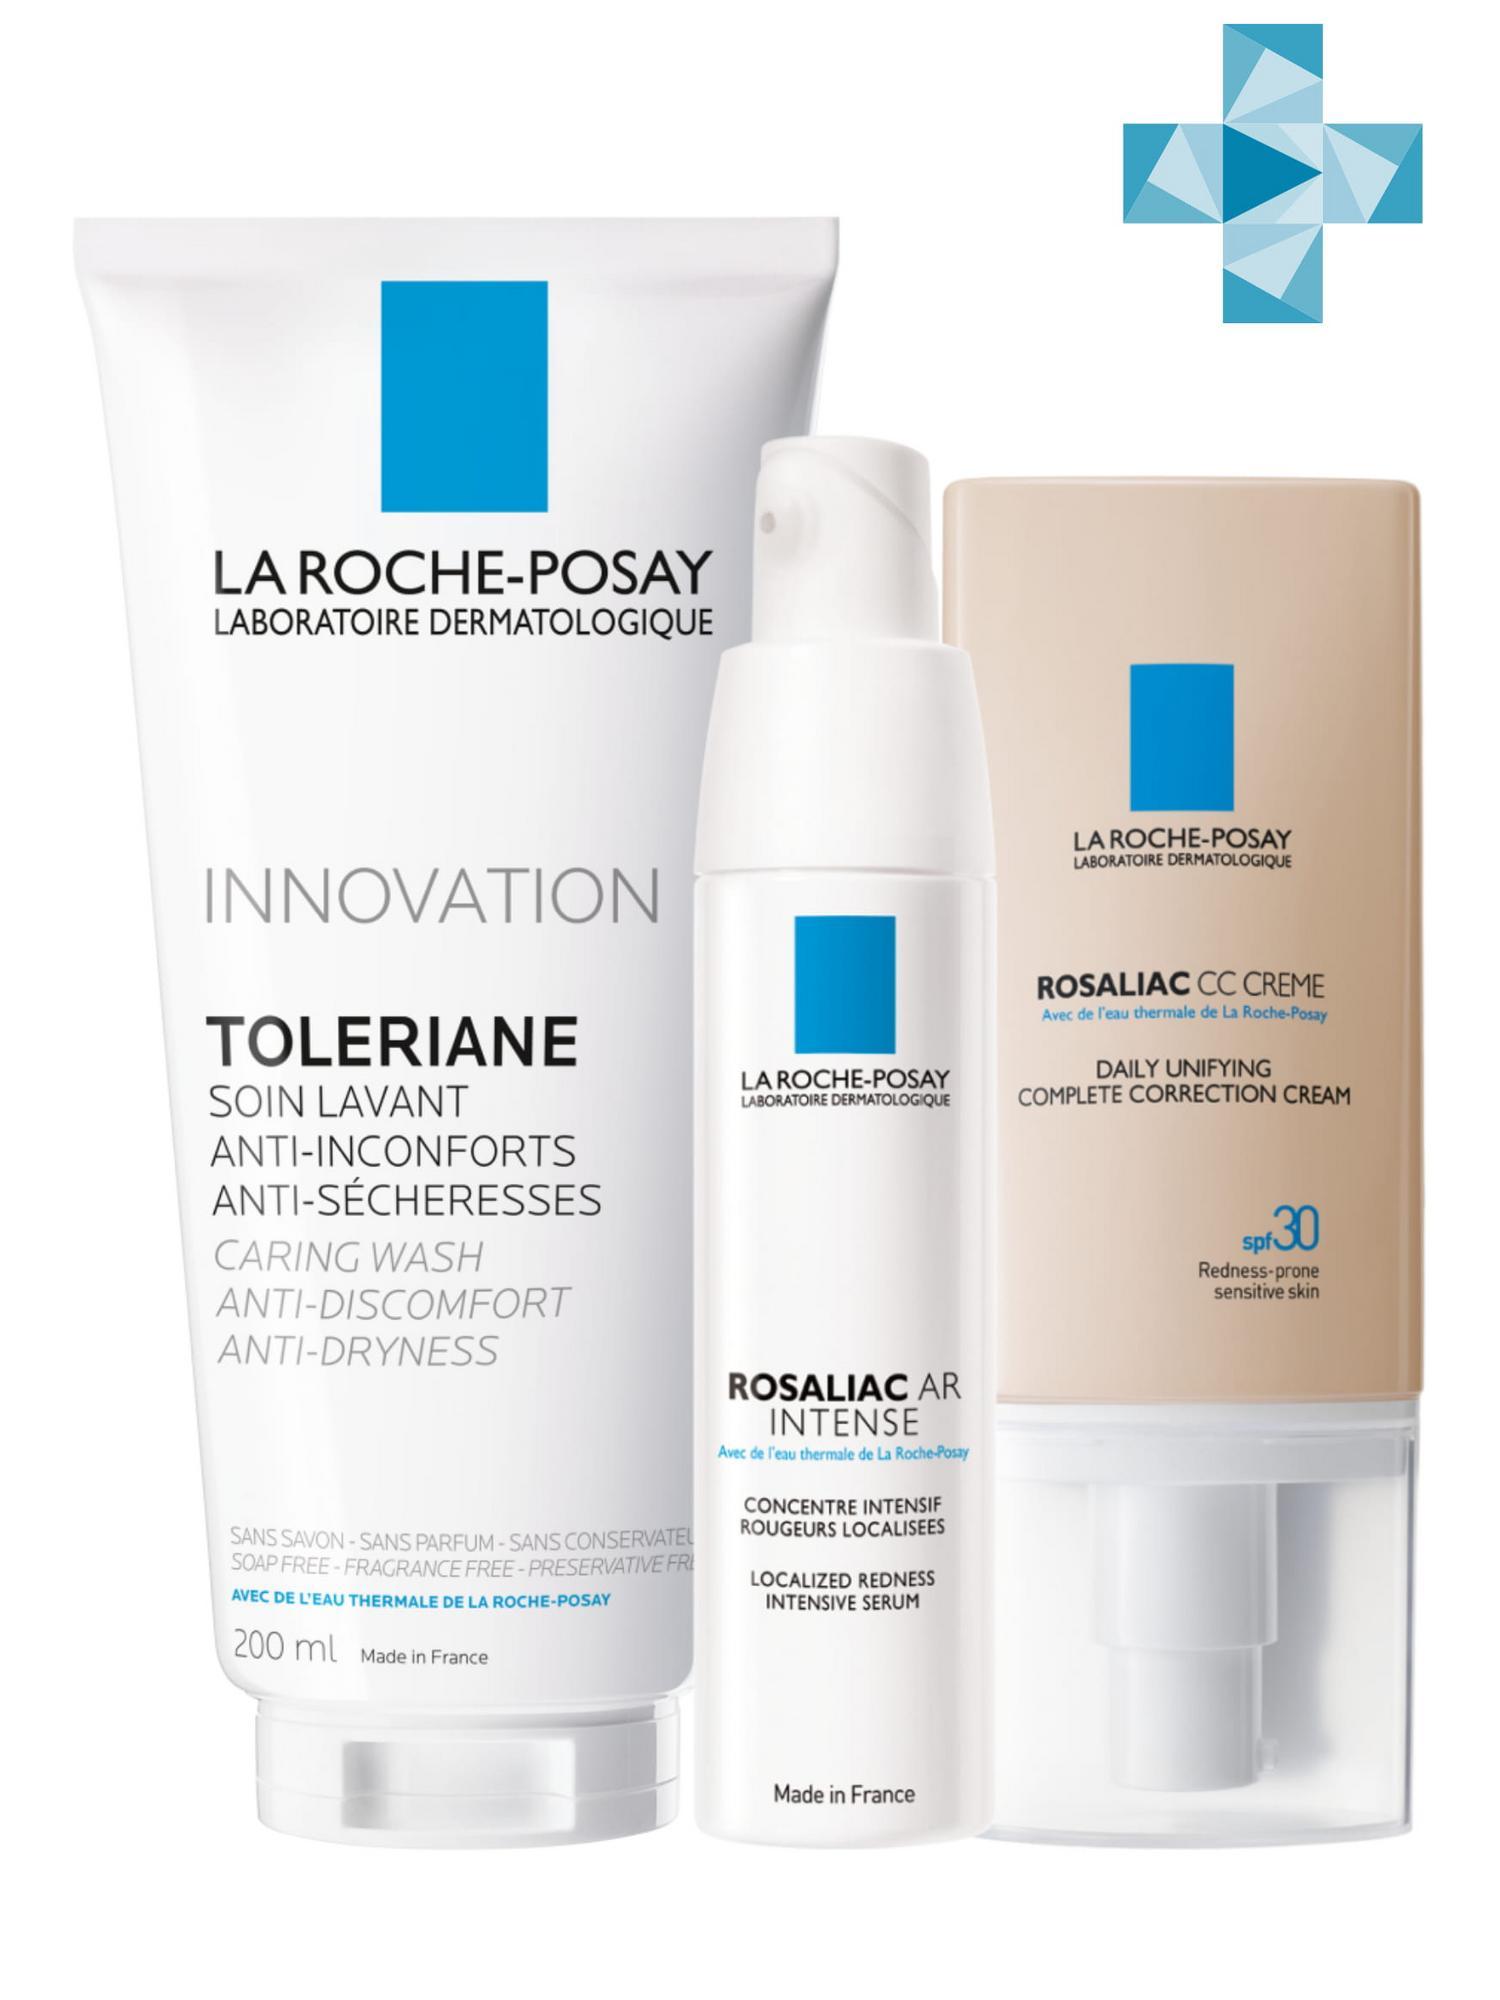 La Roche-Posay Набор Rosaliac (Интенсивная сыворотка + Крем Rosaliac СС + Очищающий гель-уход для умывания Toleriane) (La Roche-Posay, Rosaliac)